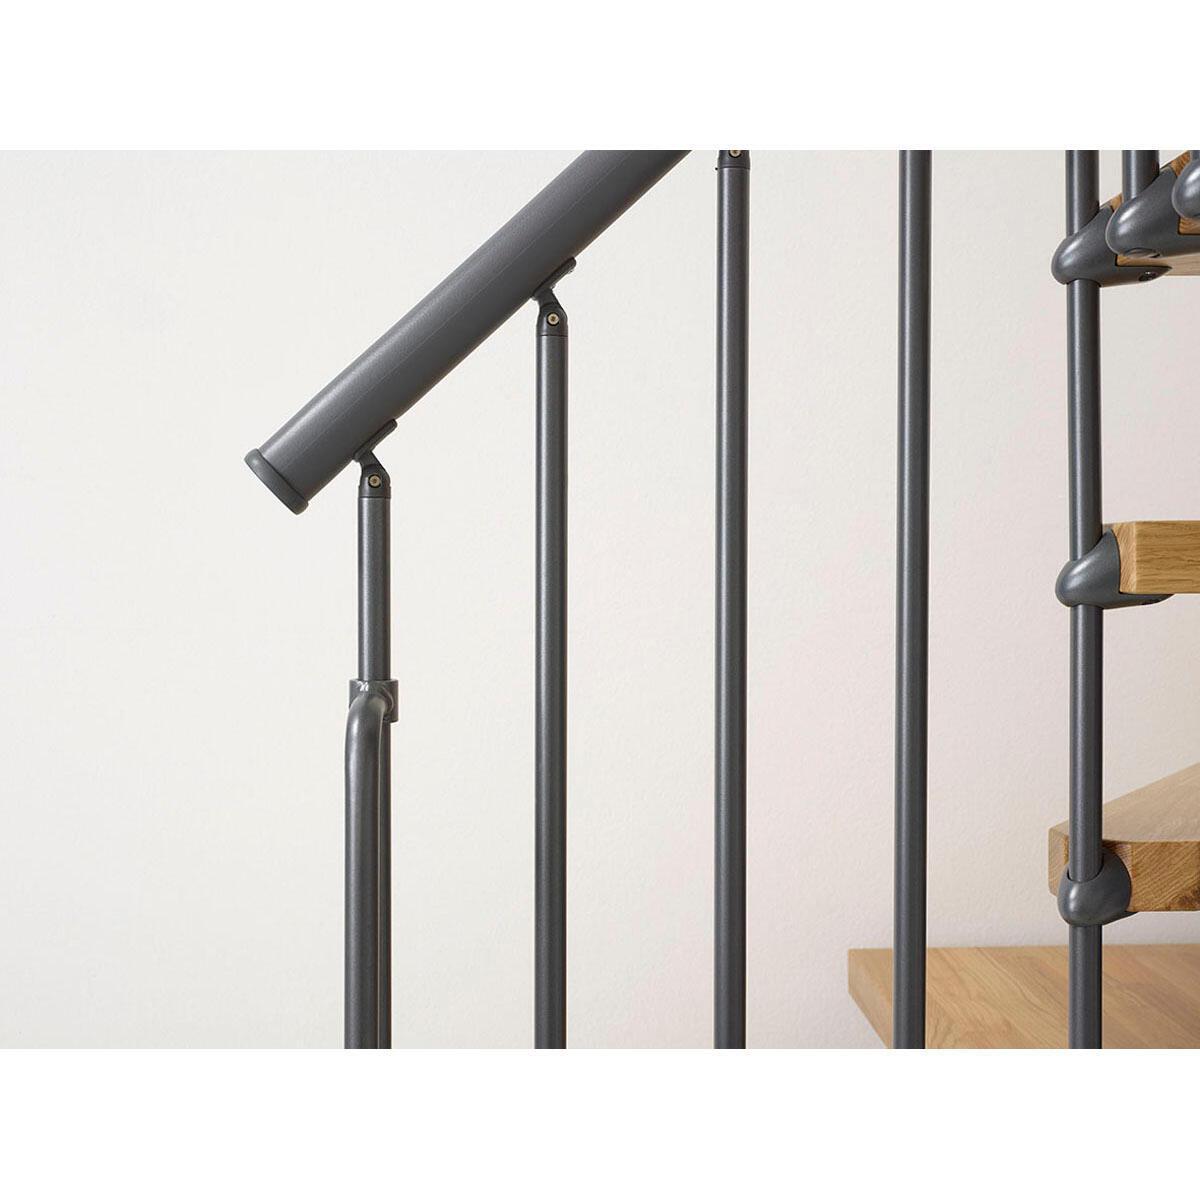 Scala a rampa 1/4 di giro OAK90 FONTANOT L 70 cm, gradino naturale, struttura antracite - 7